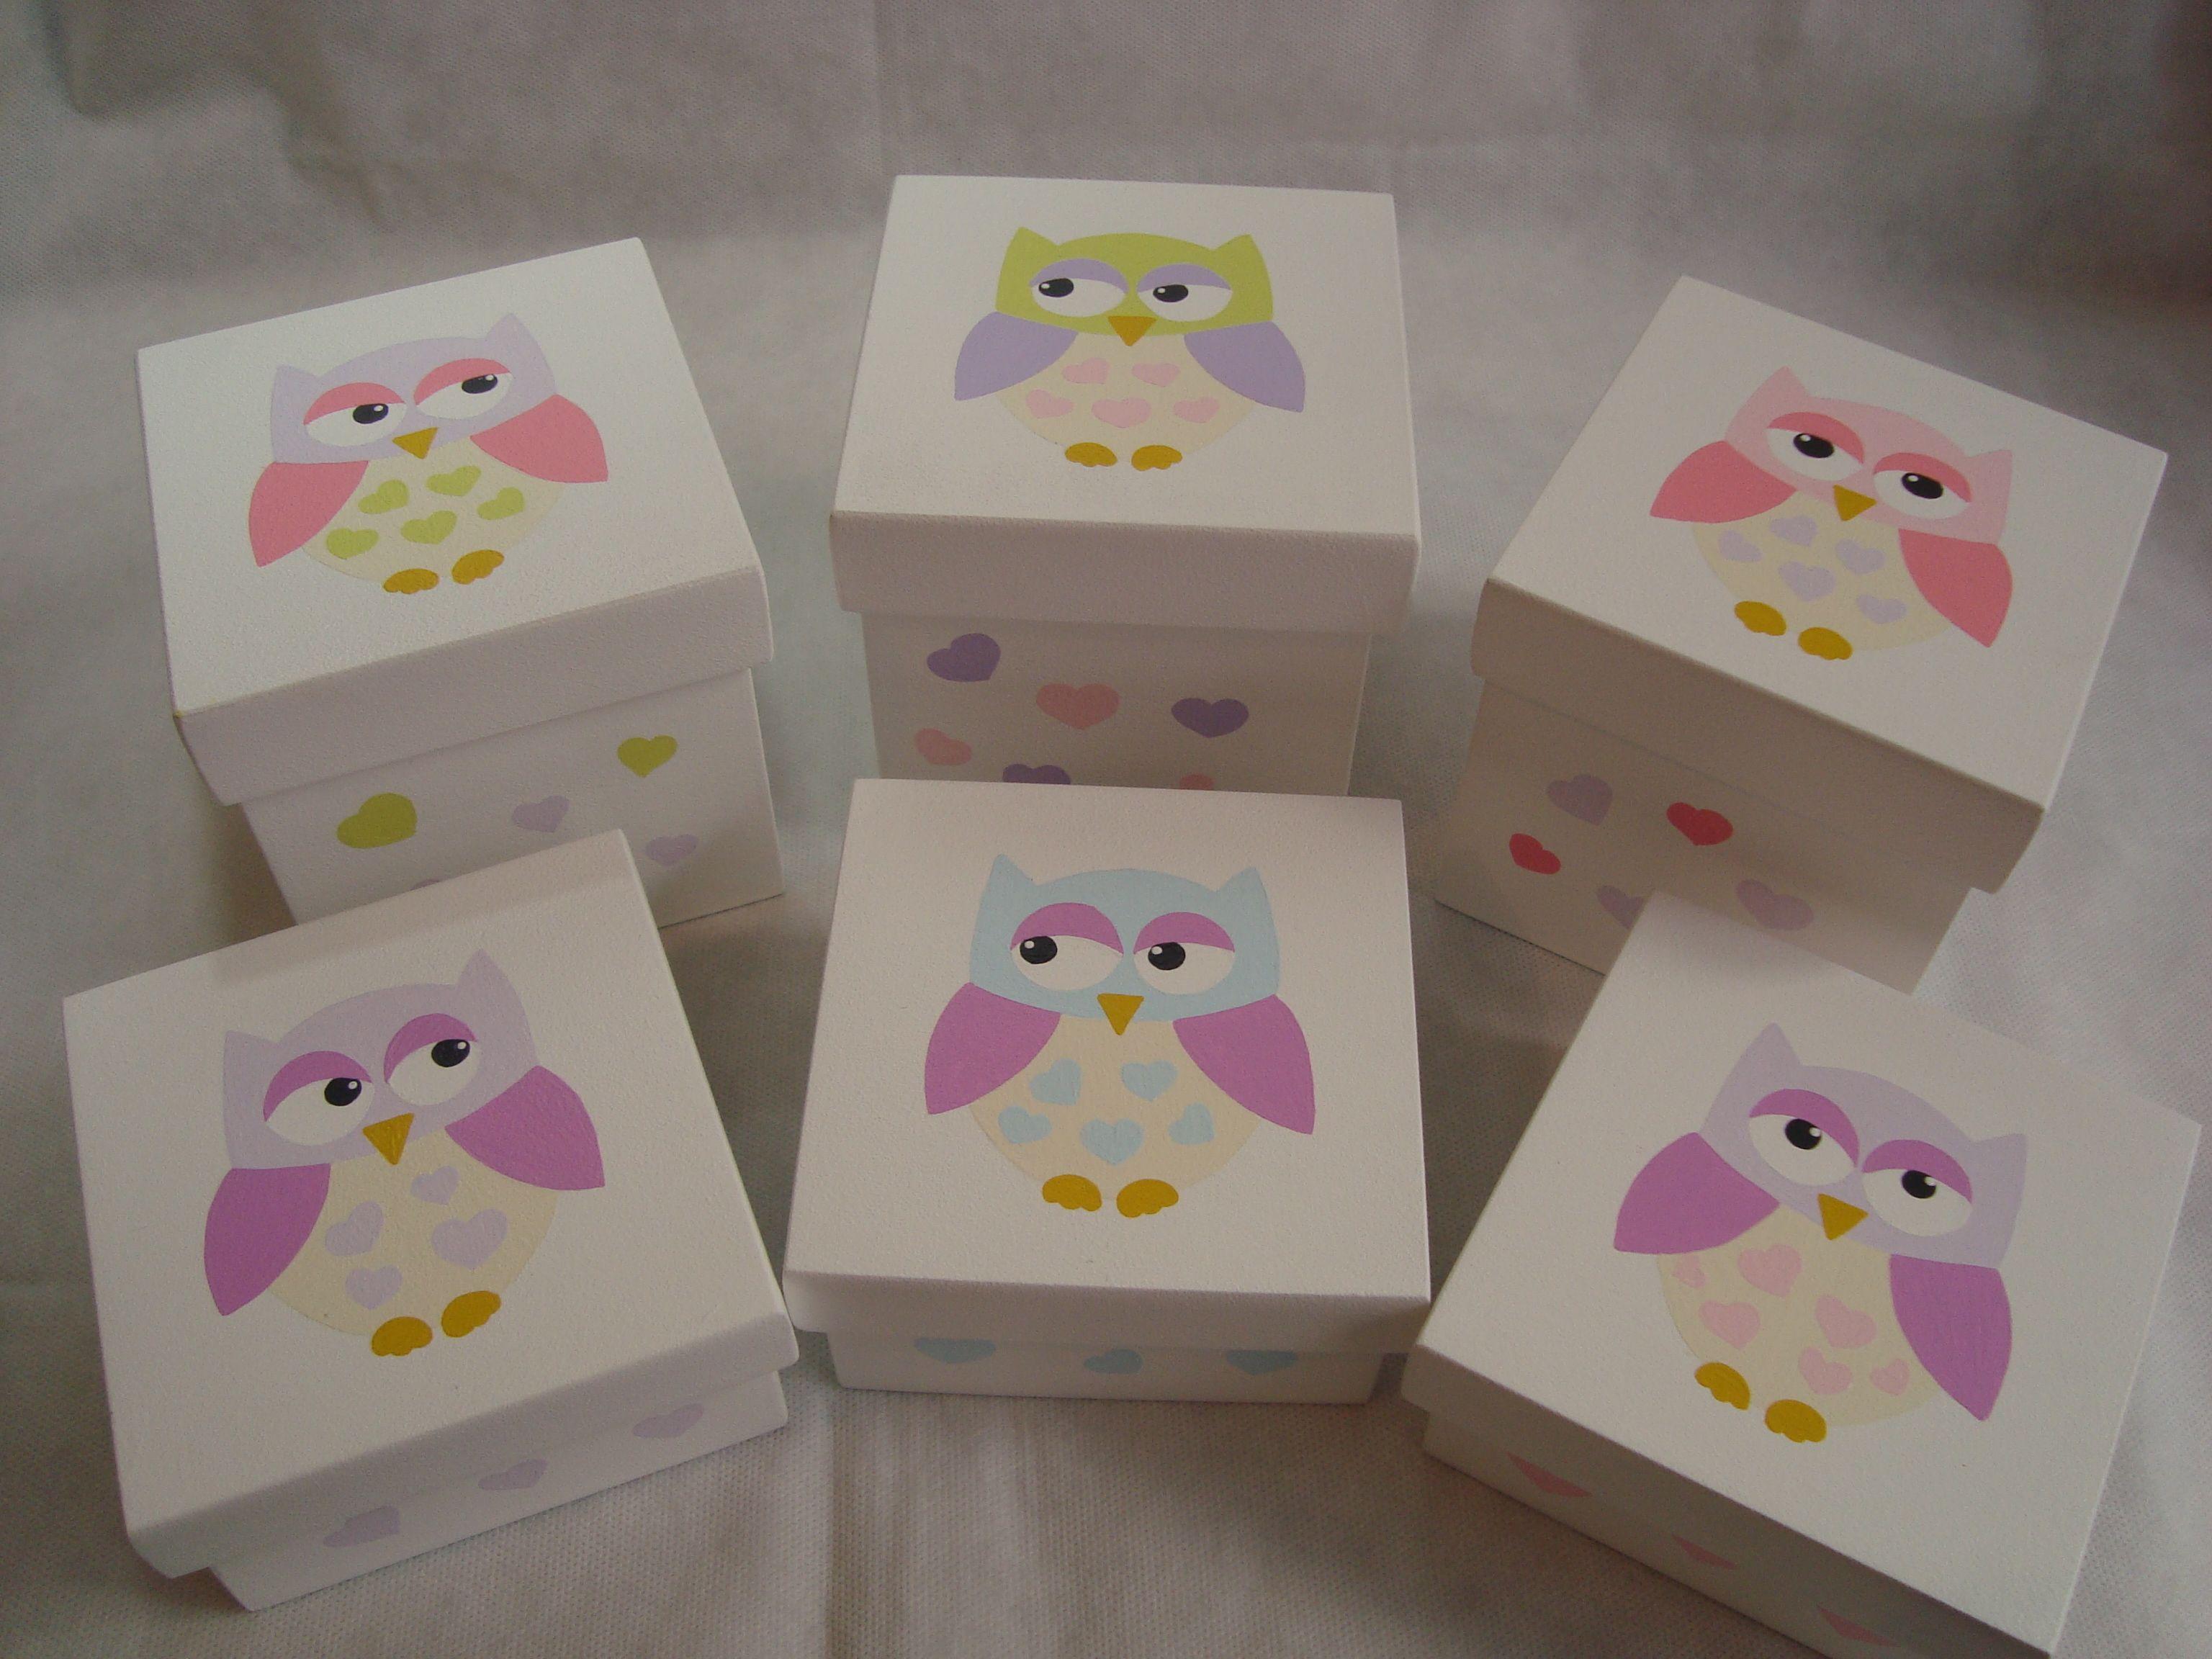 Caixas manualidades pinterest cajas caja de madera - Cajas de madera decorativas ...